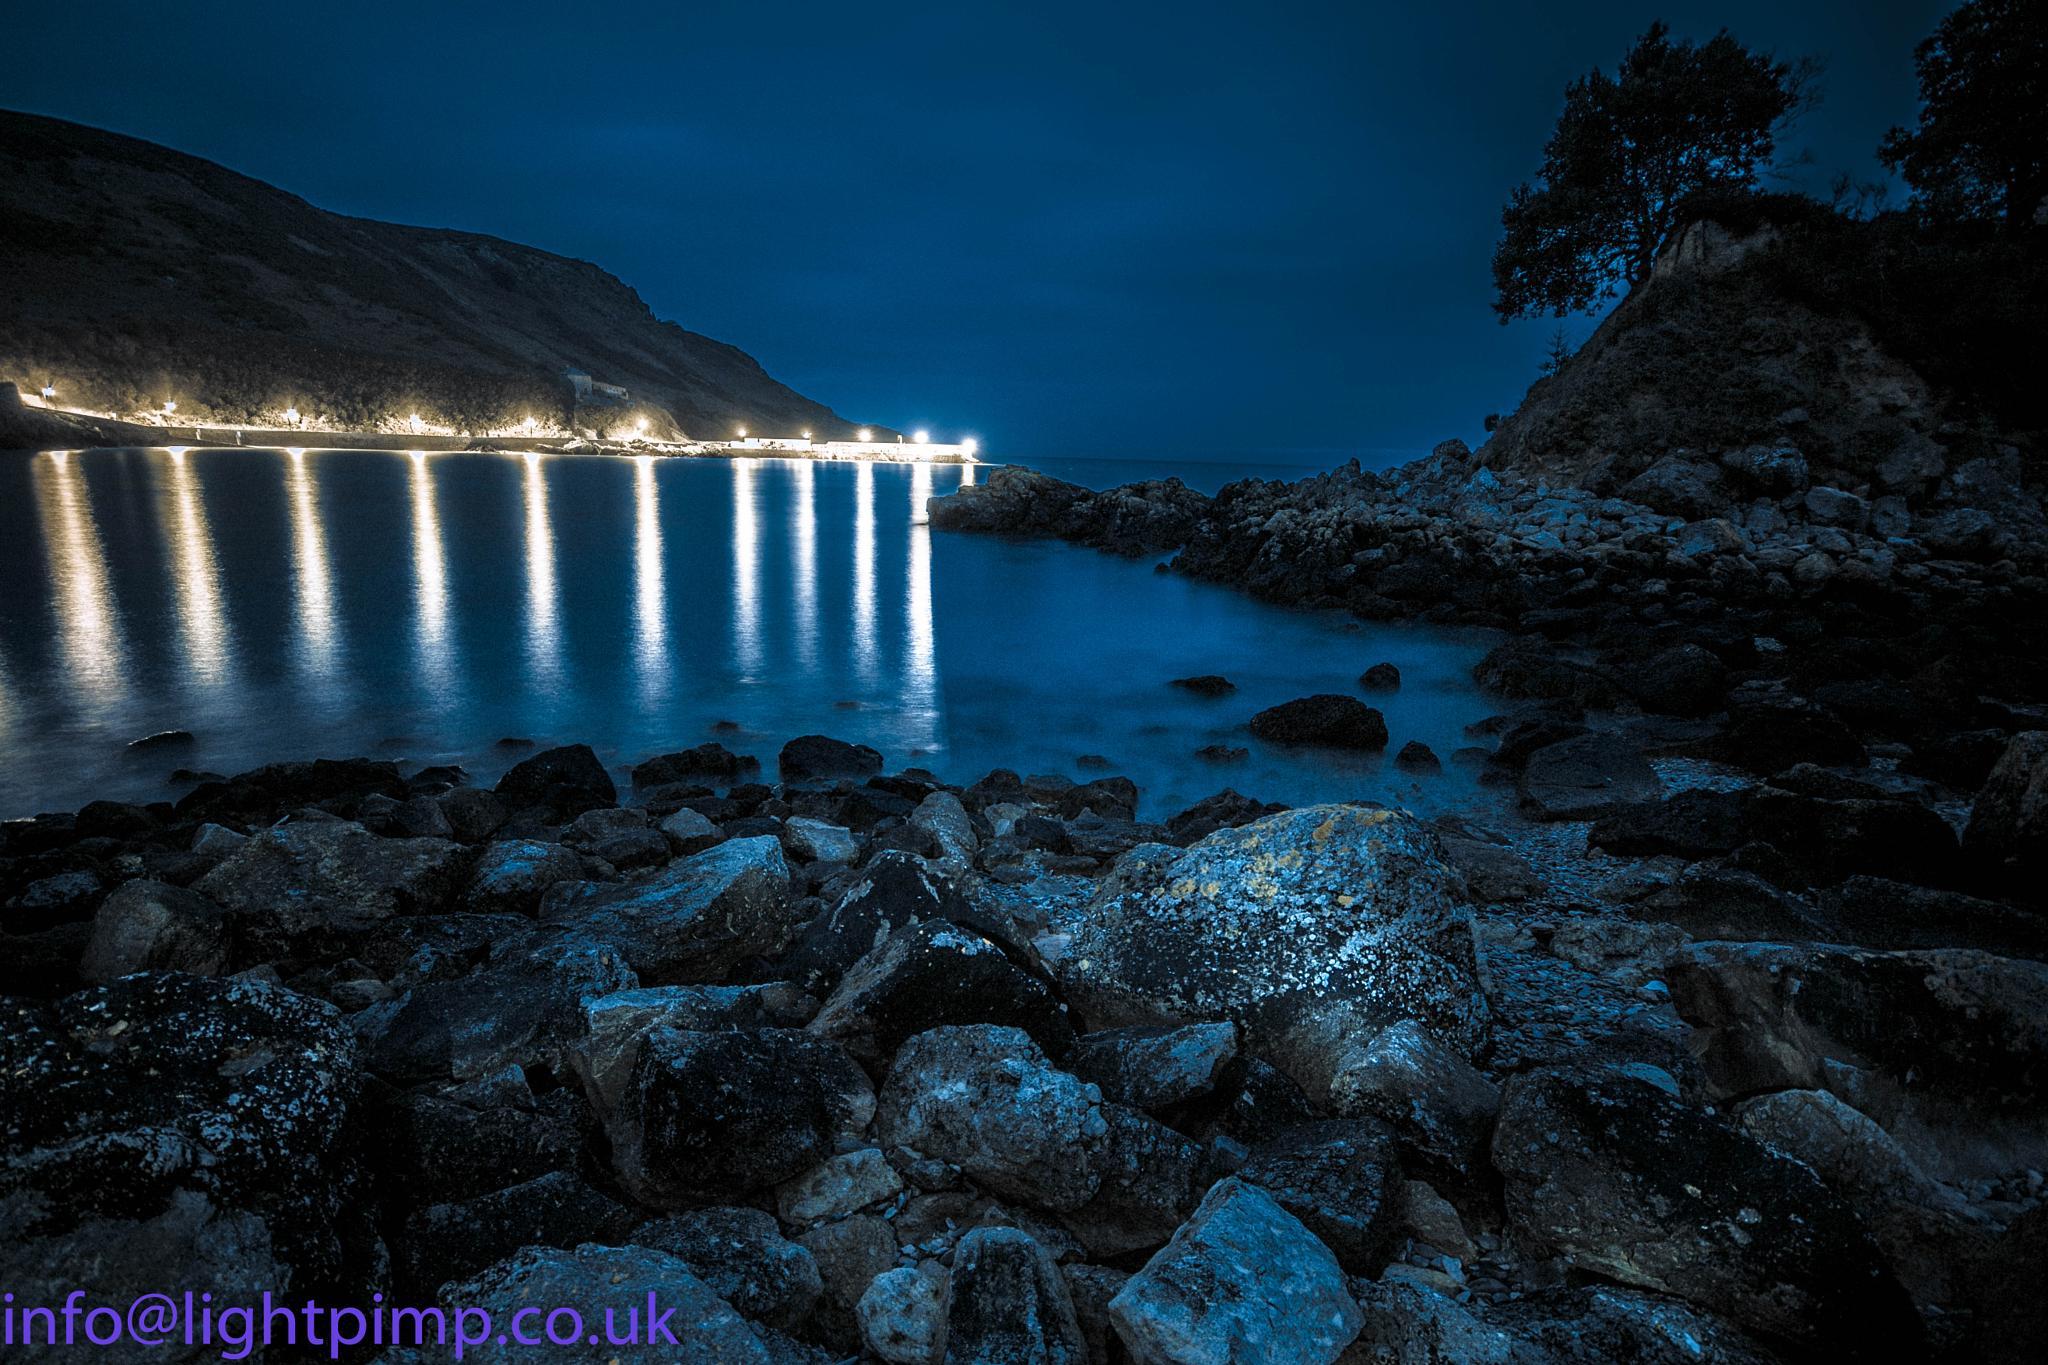 Twilight At Bouley Bay  by Lightpimp - Jersey